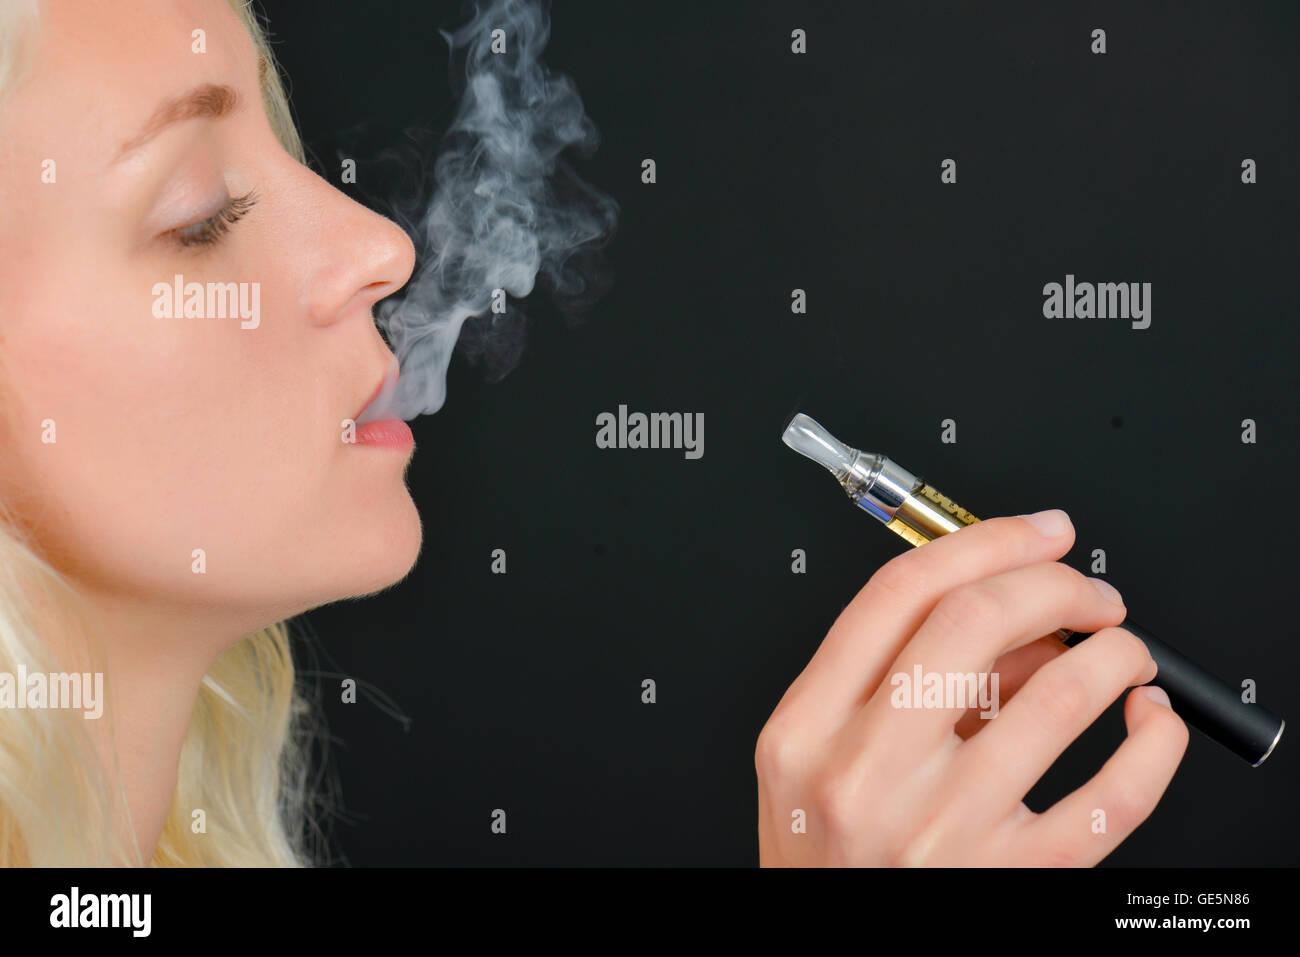 Electronic cigarette - Stock Image